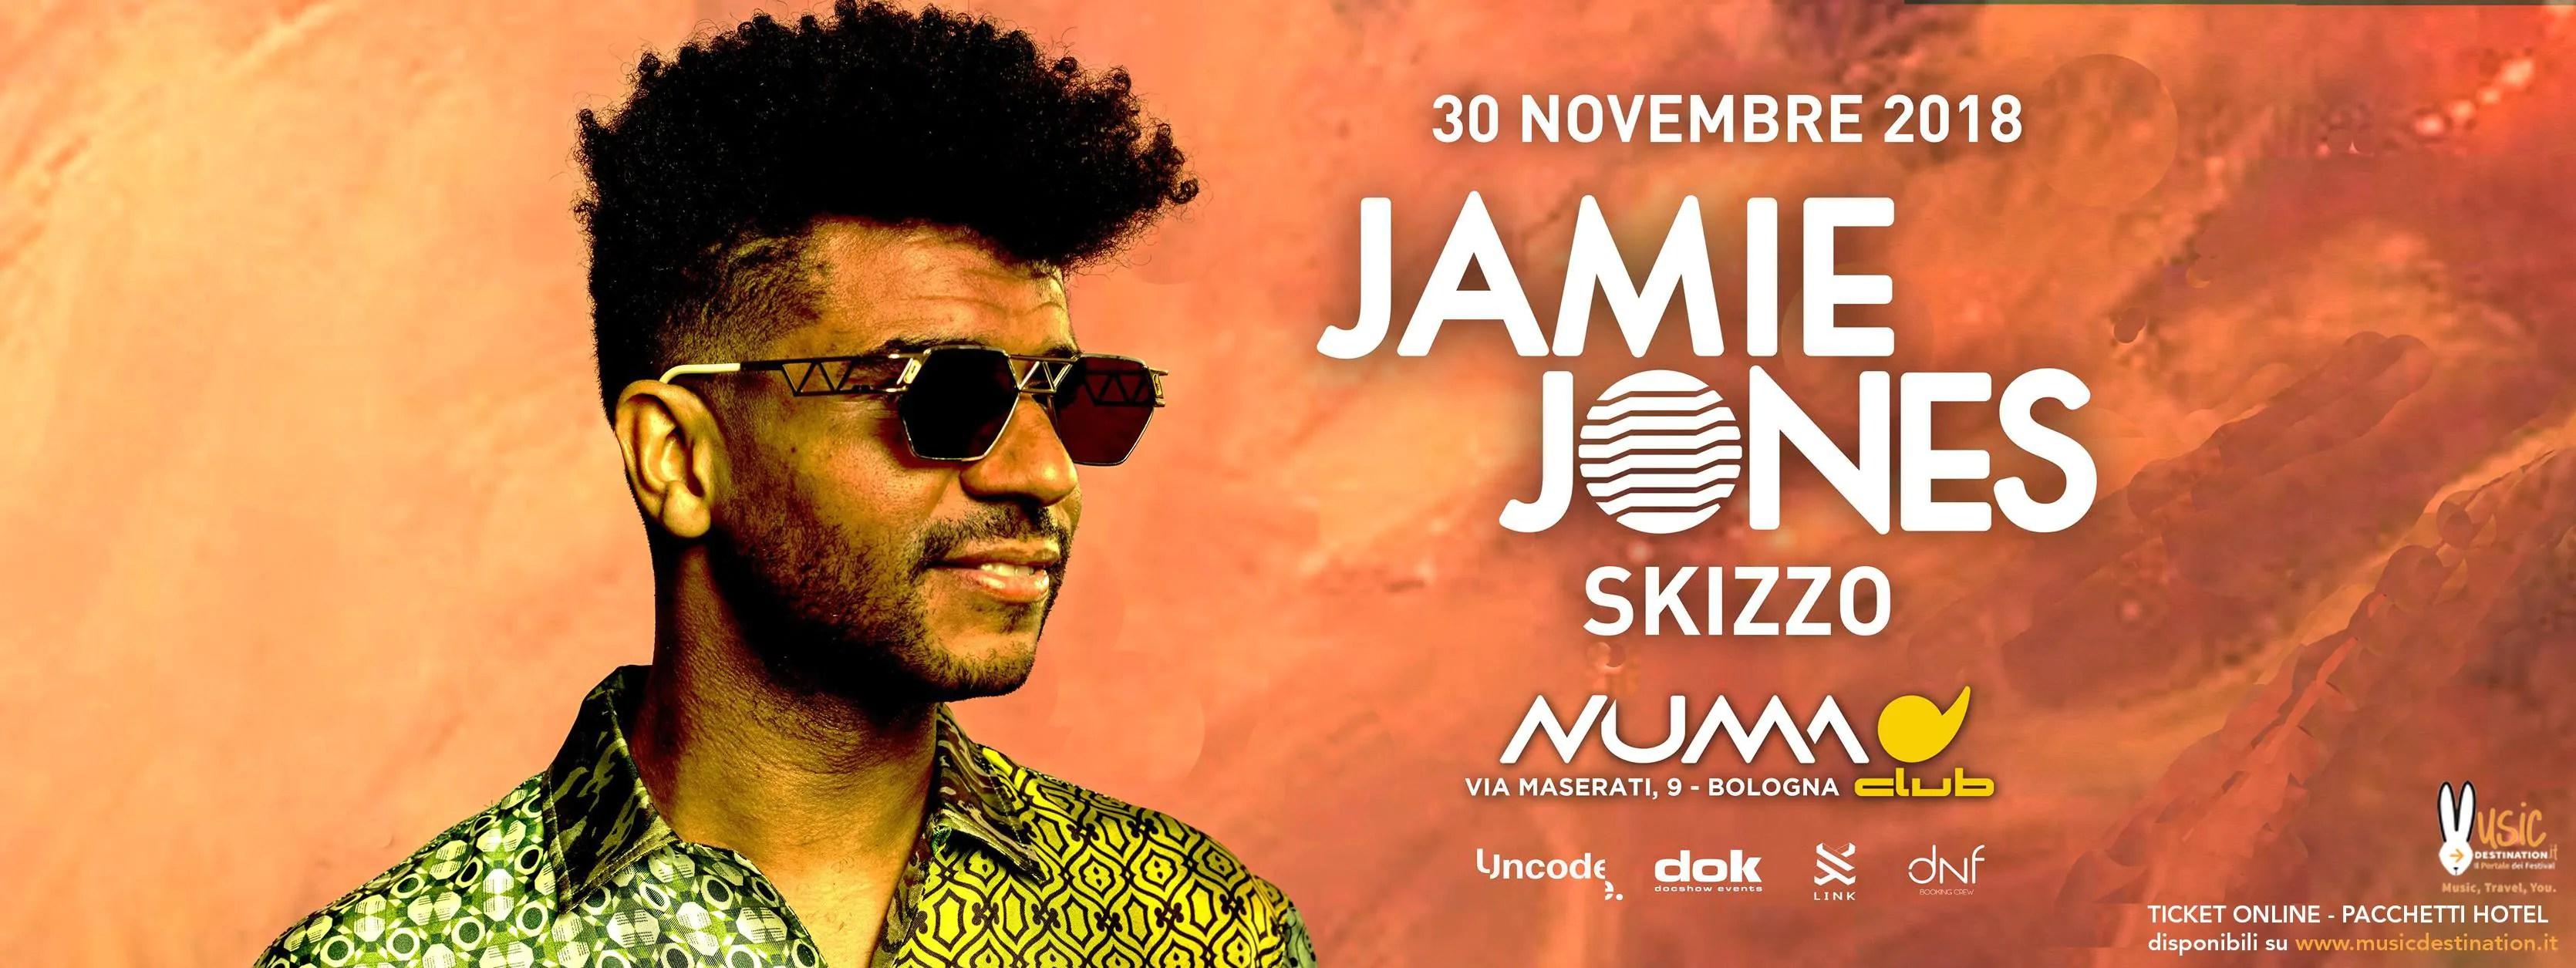 Jamie Jones Numa Bologna30 Ottobre Ticket Pacchetti Hotel